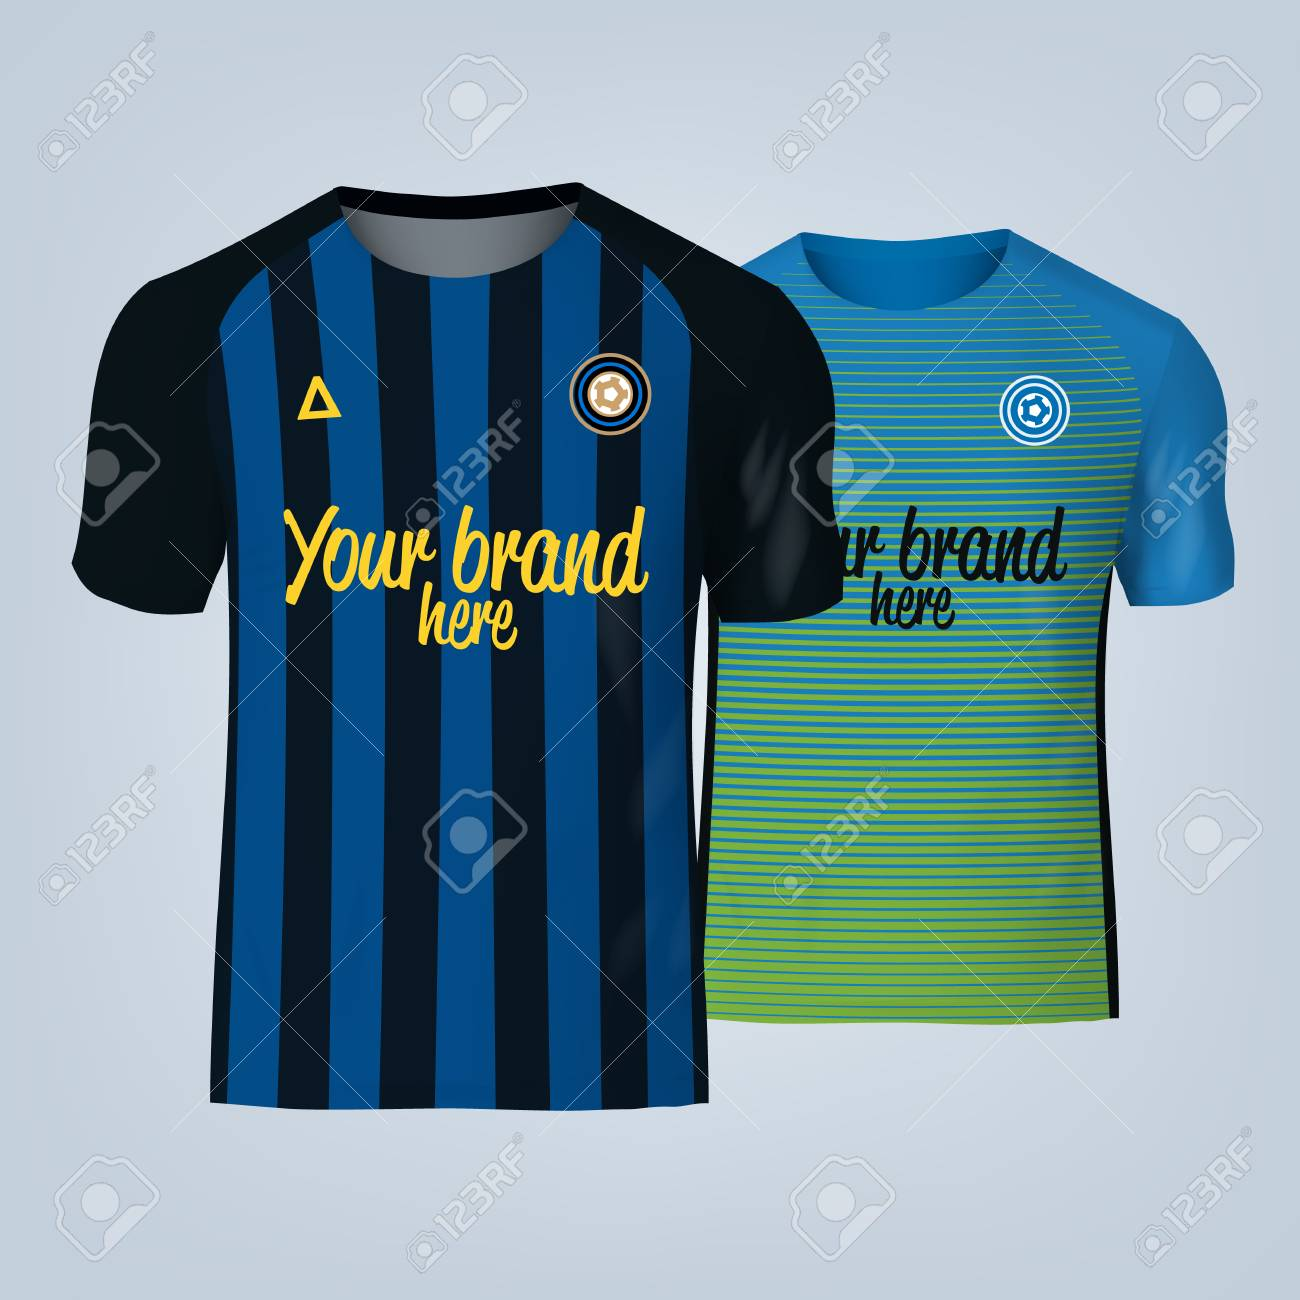 Vector illustration of football t-shirt template. - 84012297